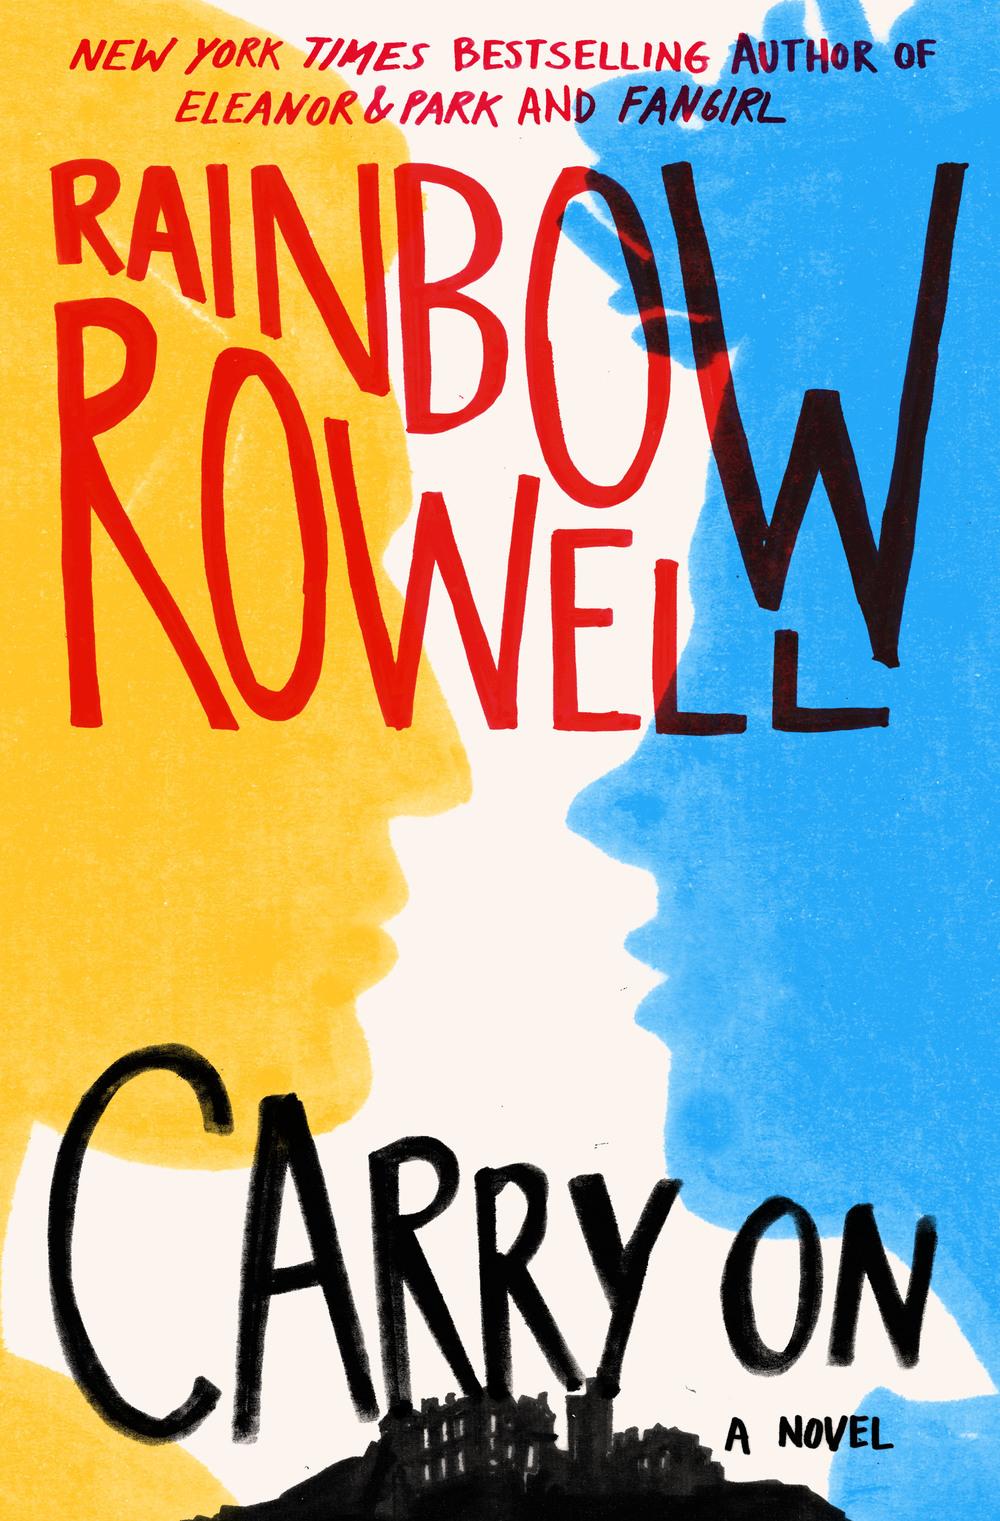 Top 10 Kids/YA Carry On by Rainbow Rowell